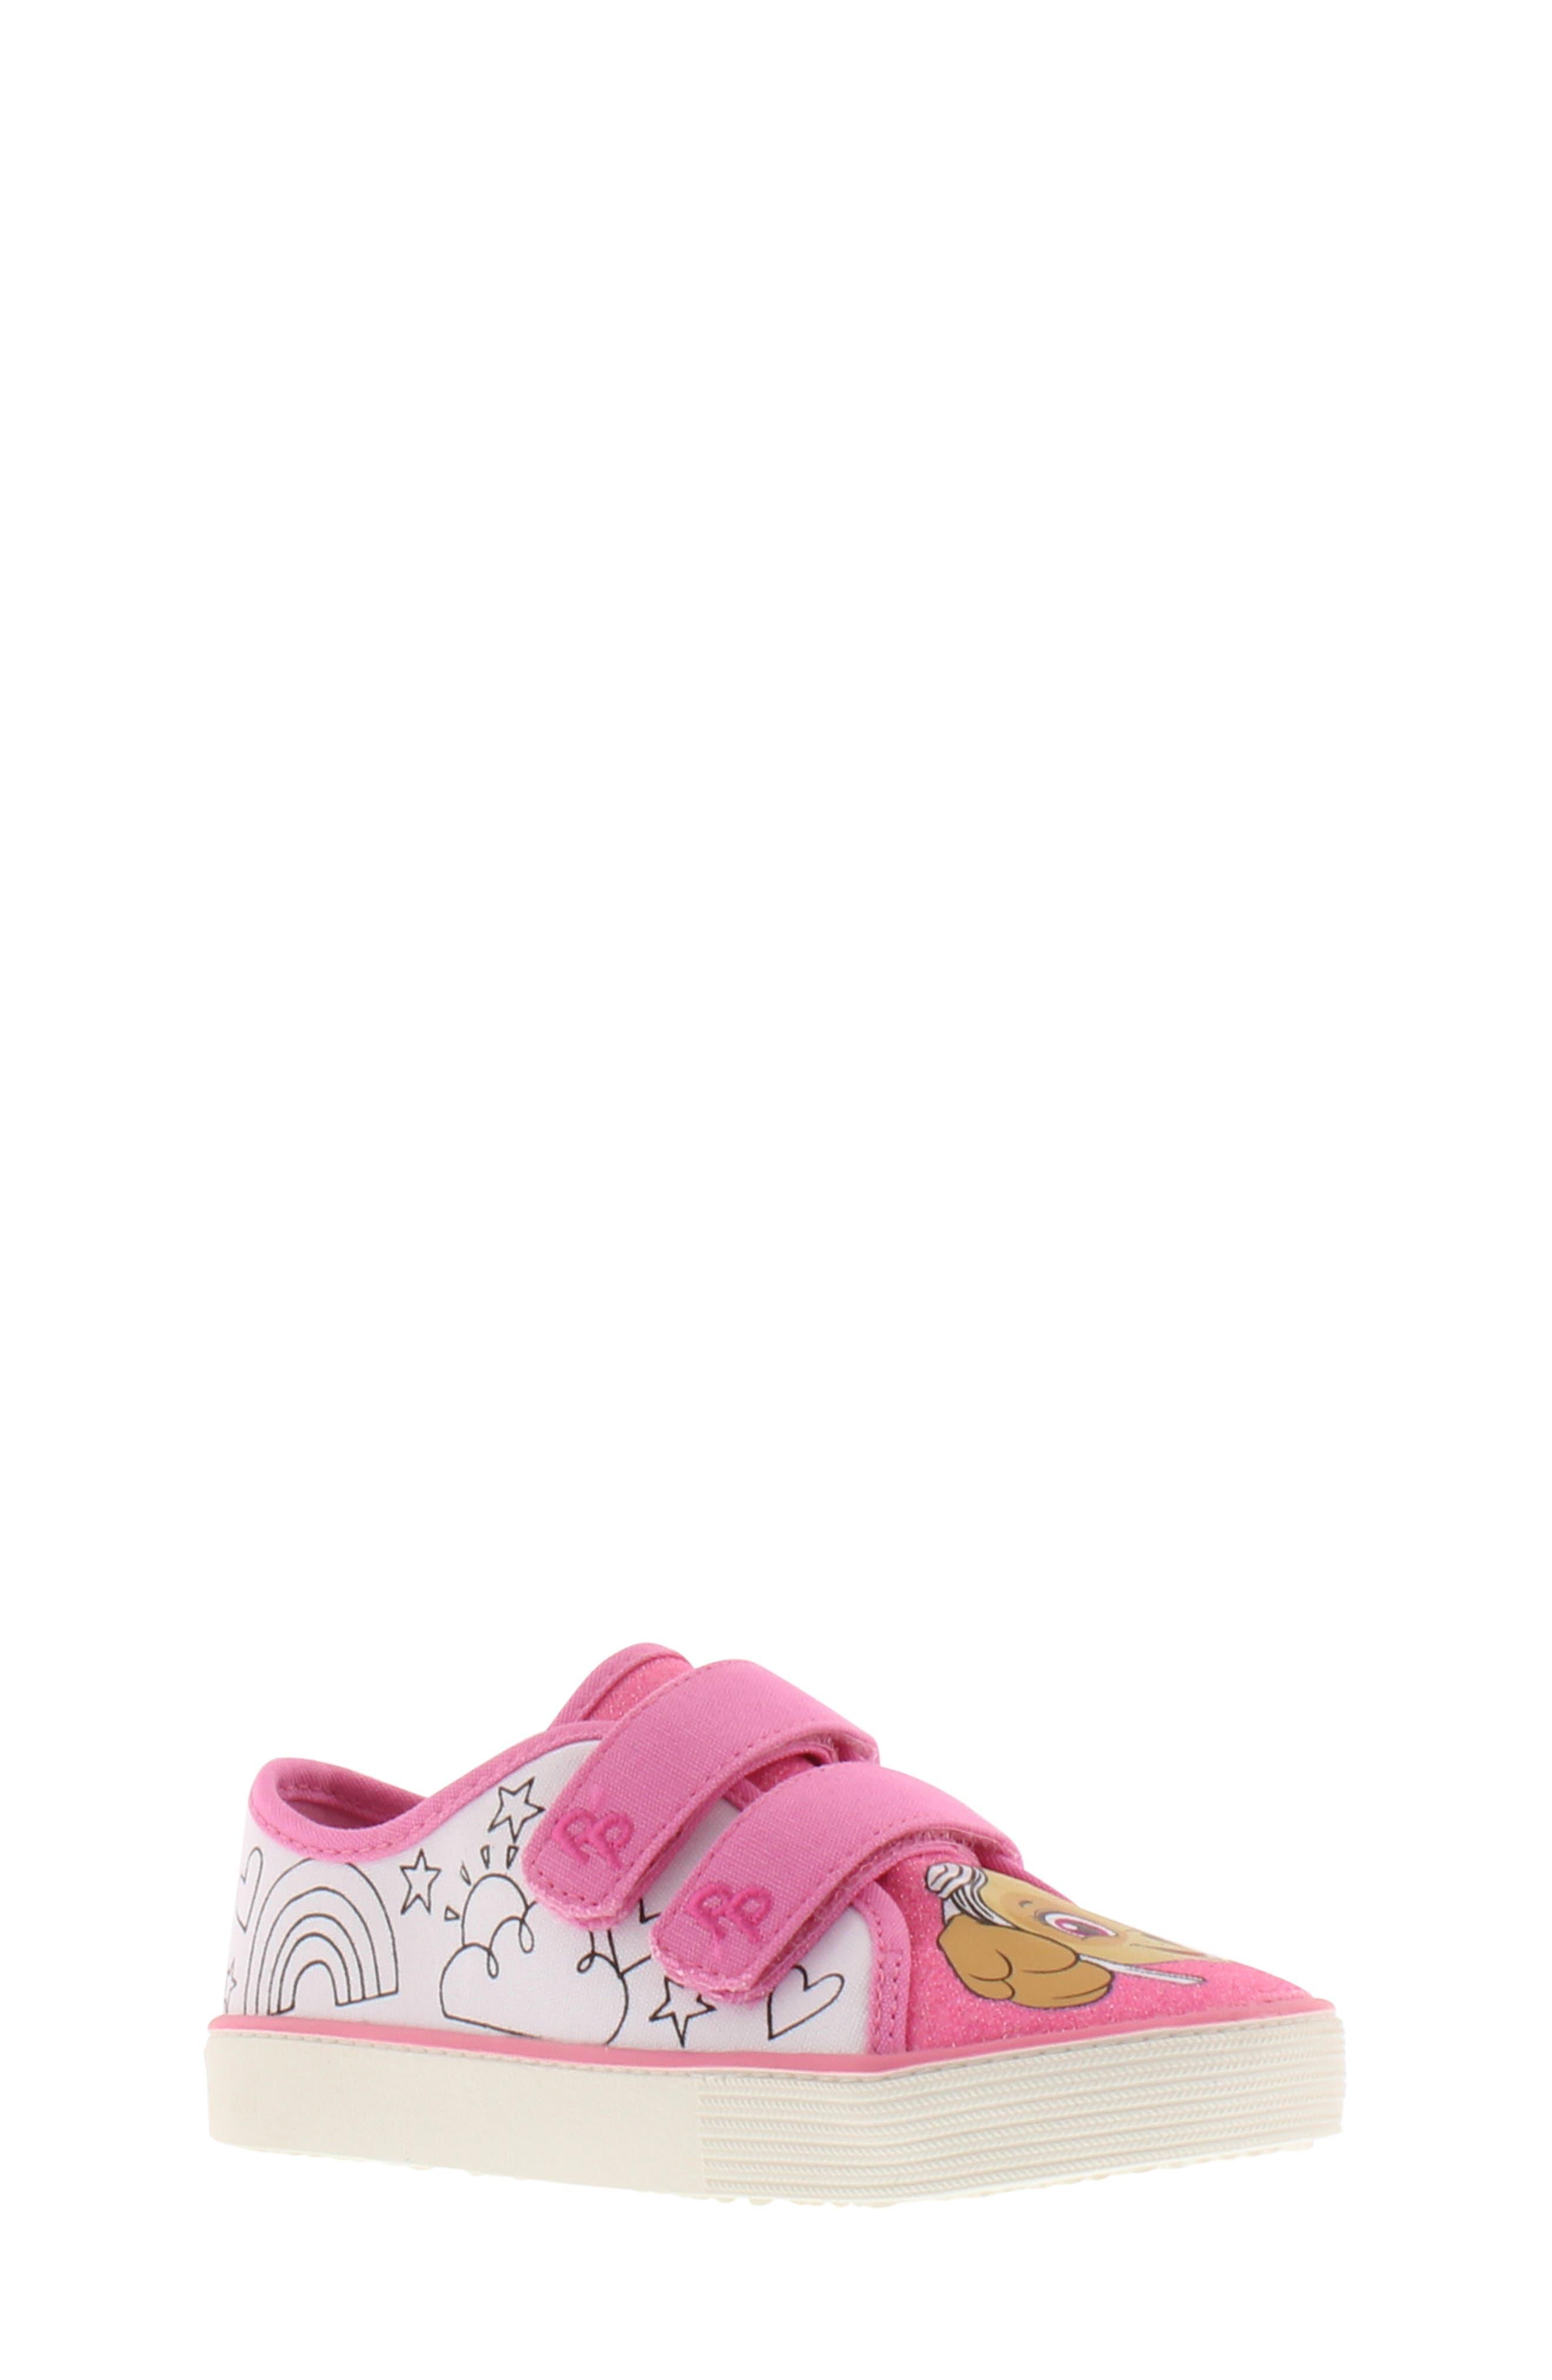 PAW PATROL Skye Color DIY Sneaker, Main, color, 685